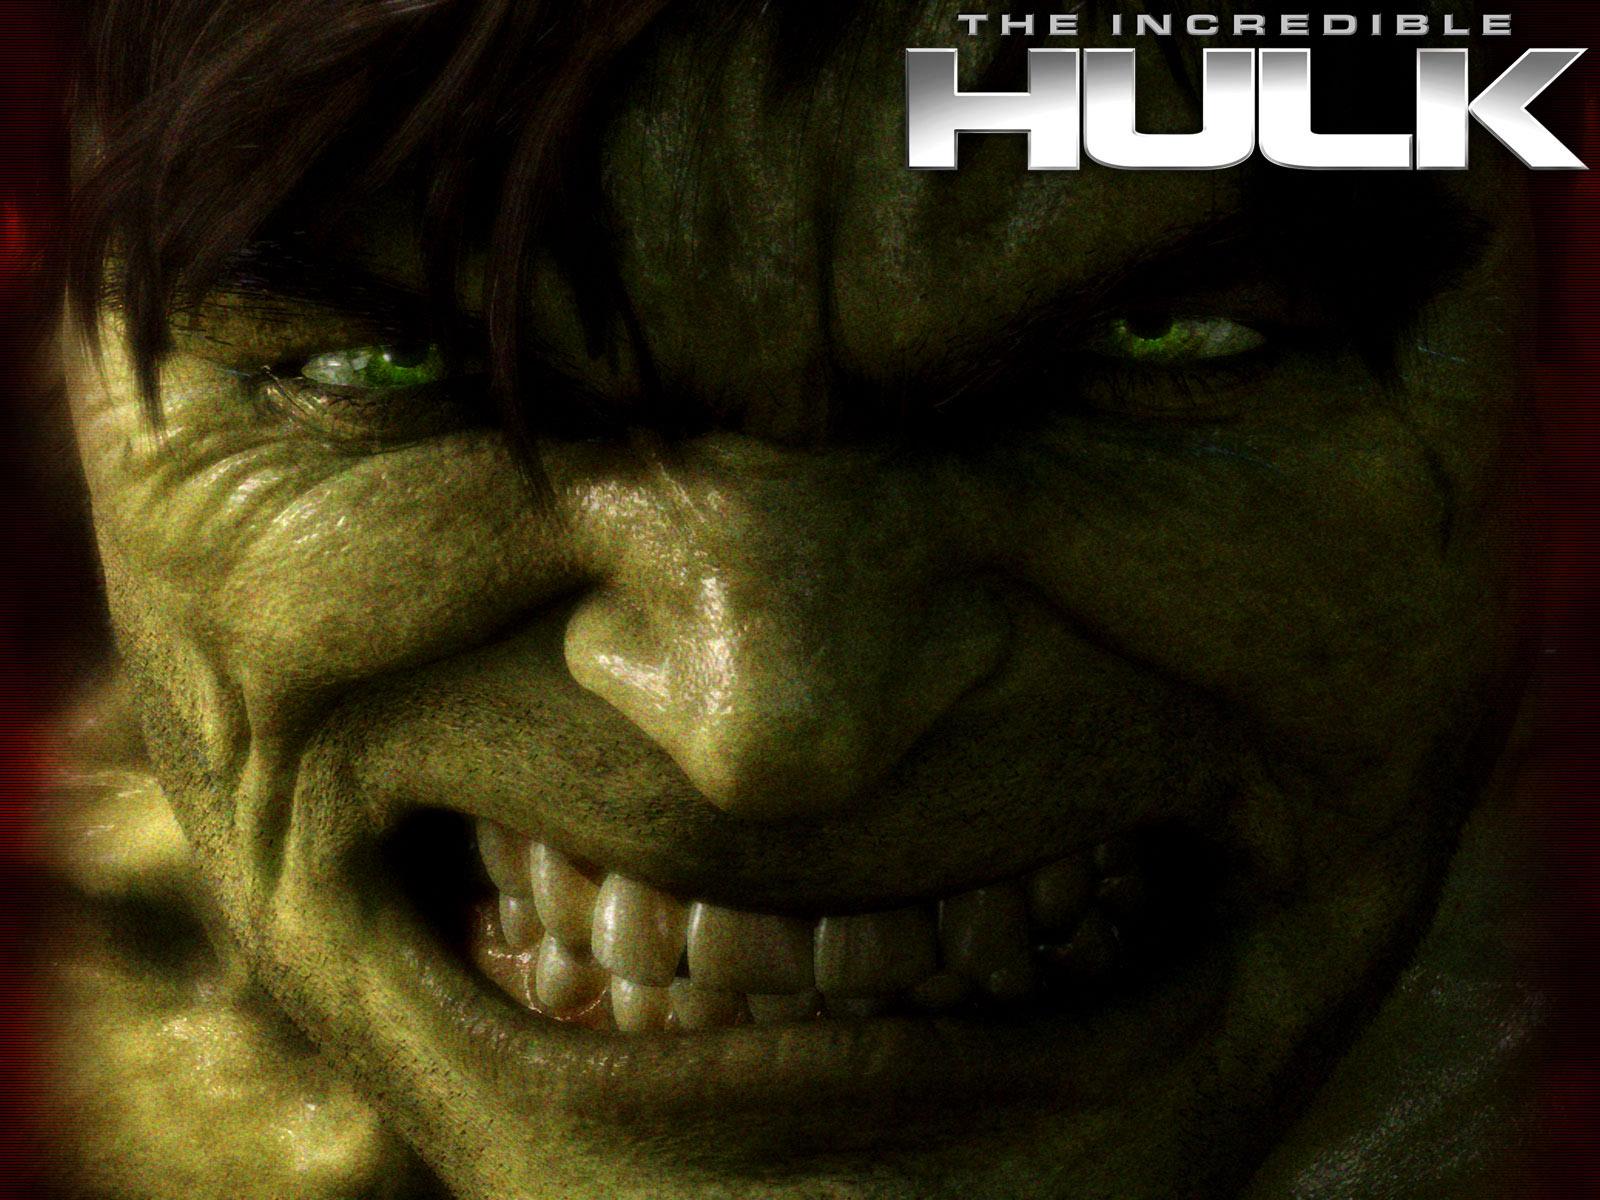 fast pics2 hd anime Wallpapers Pelicula Hulk y 1600x1200